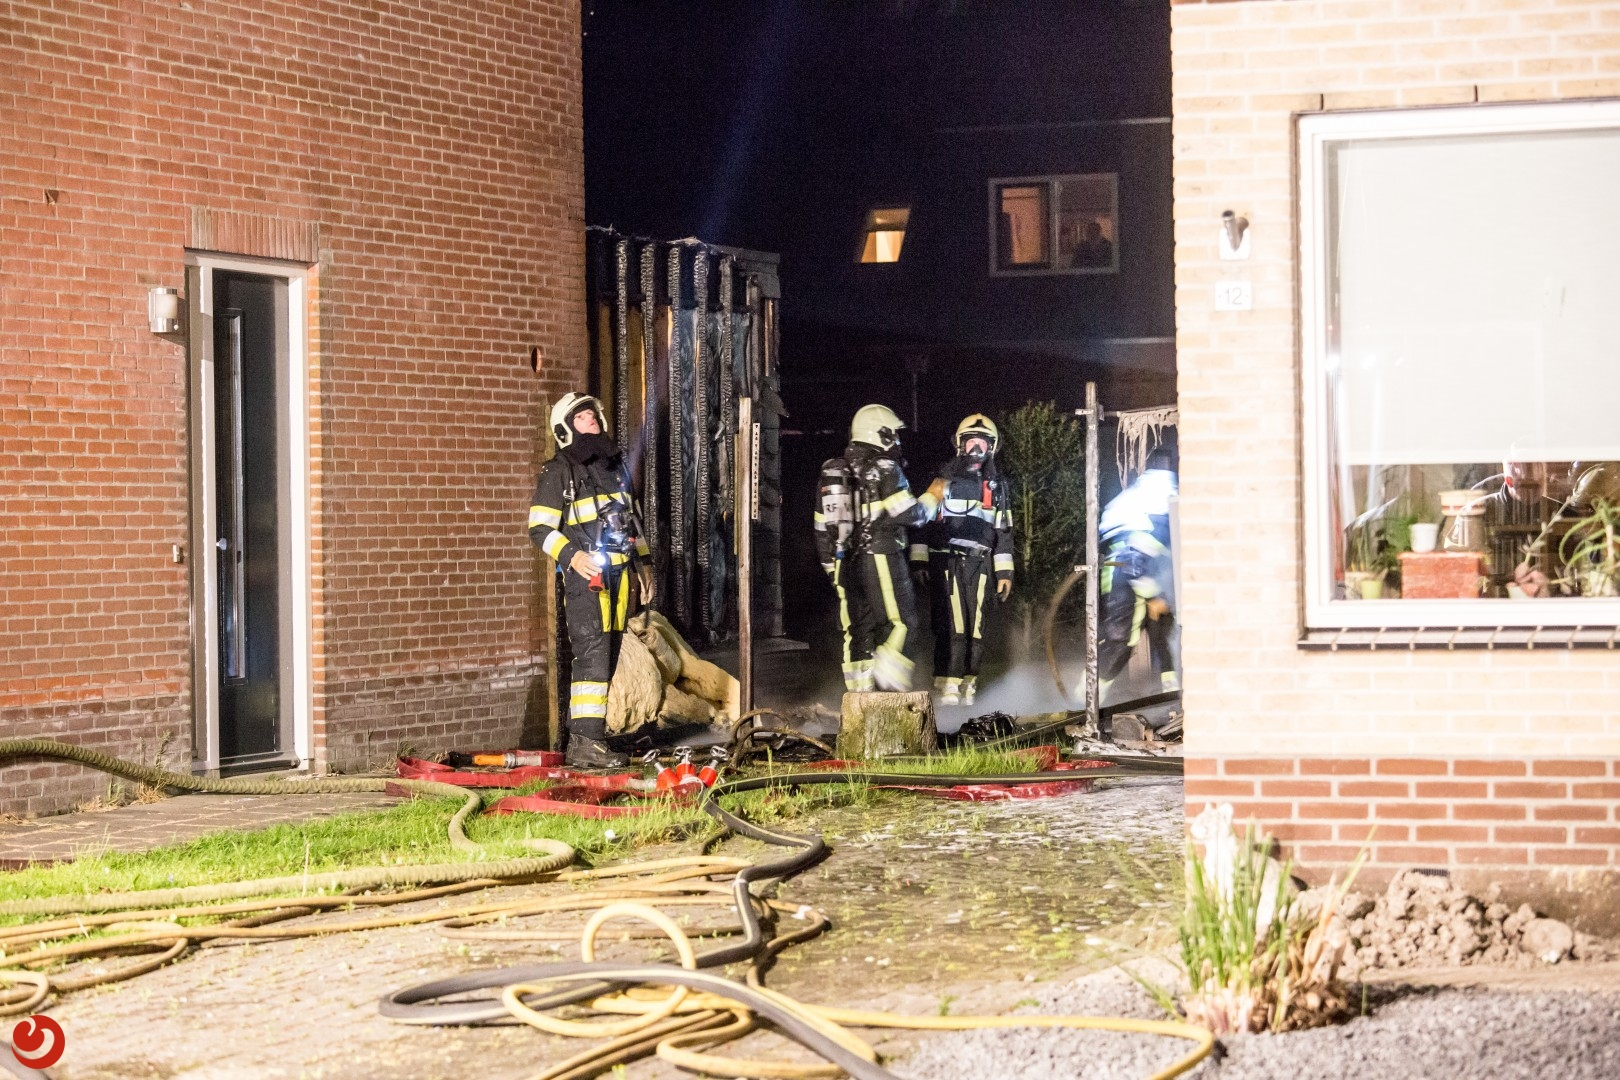 Felle schuurbrand achter woningen